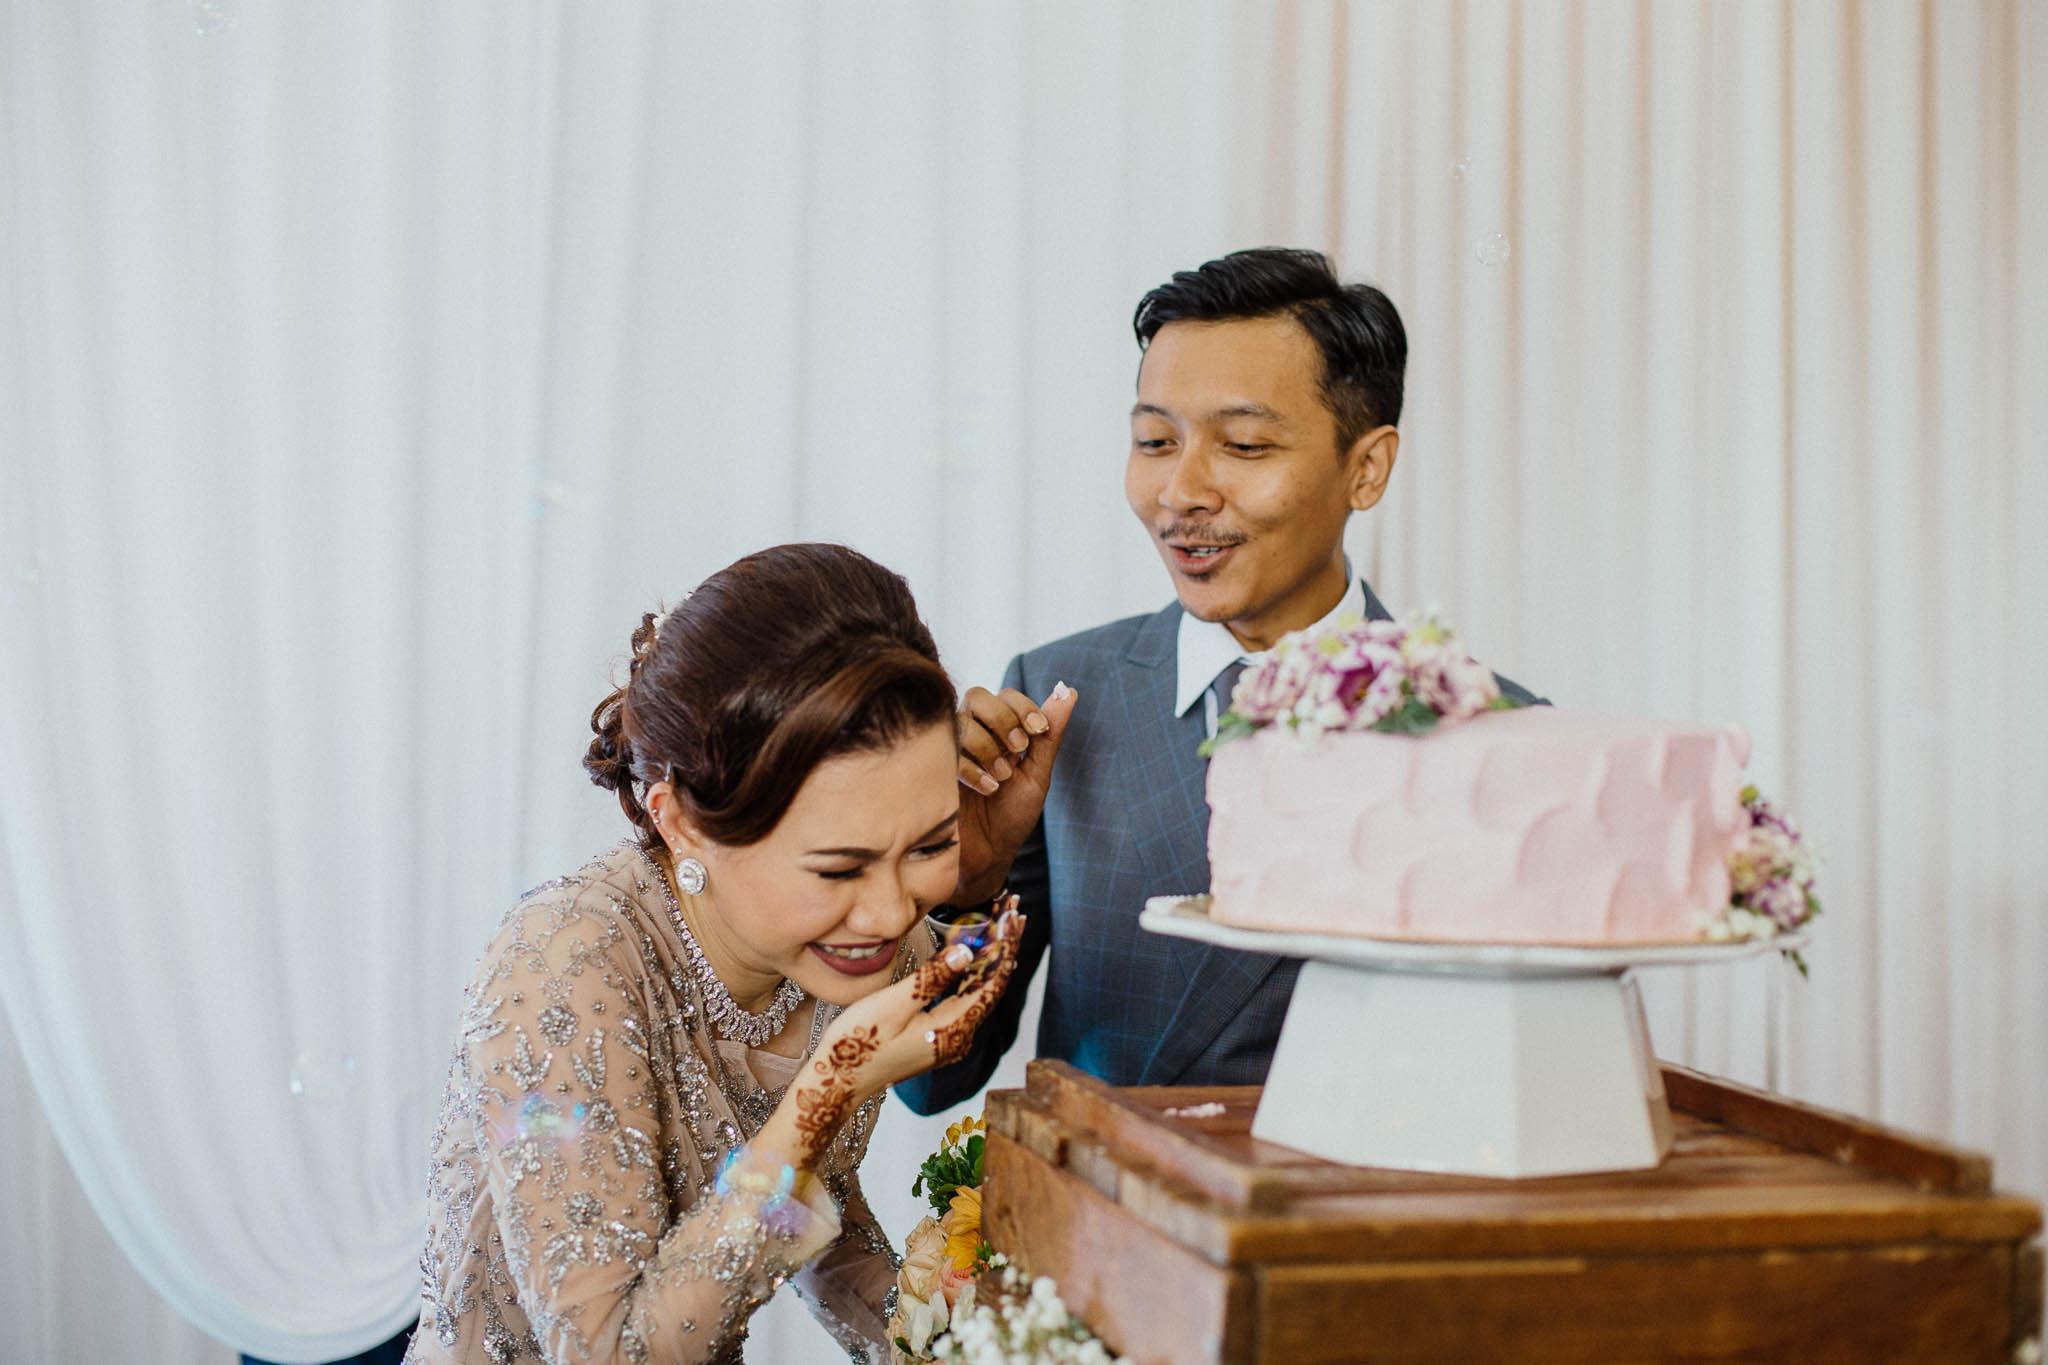 singapore-wedding-photographer-addafiq-nufail-053.jpg